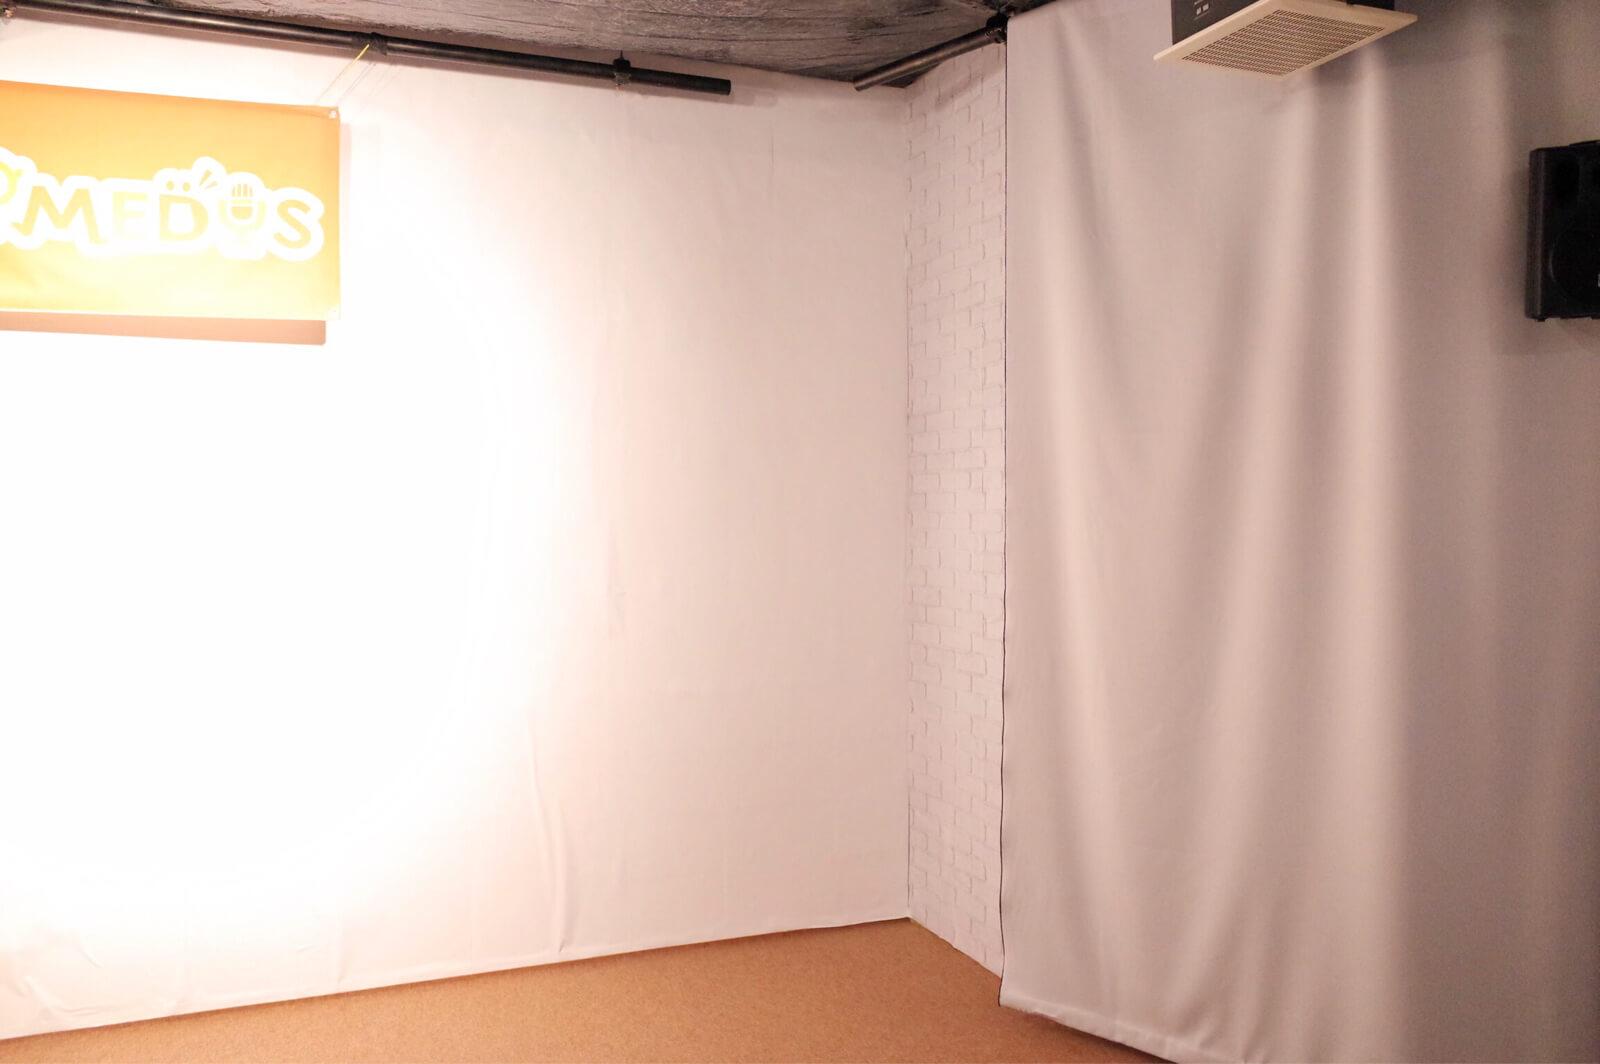 COMEDYS 壁